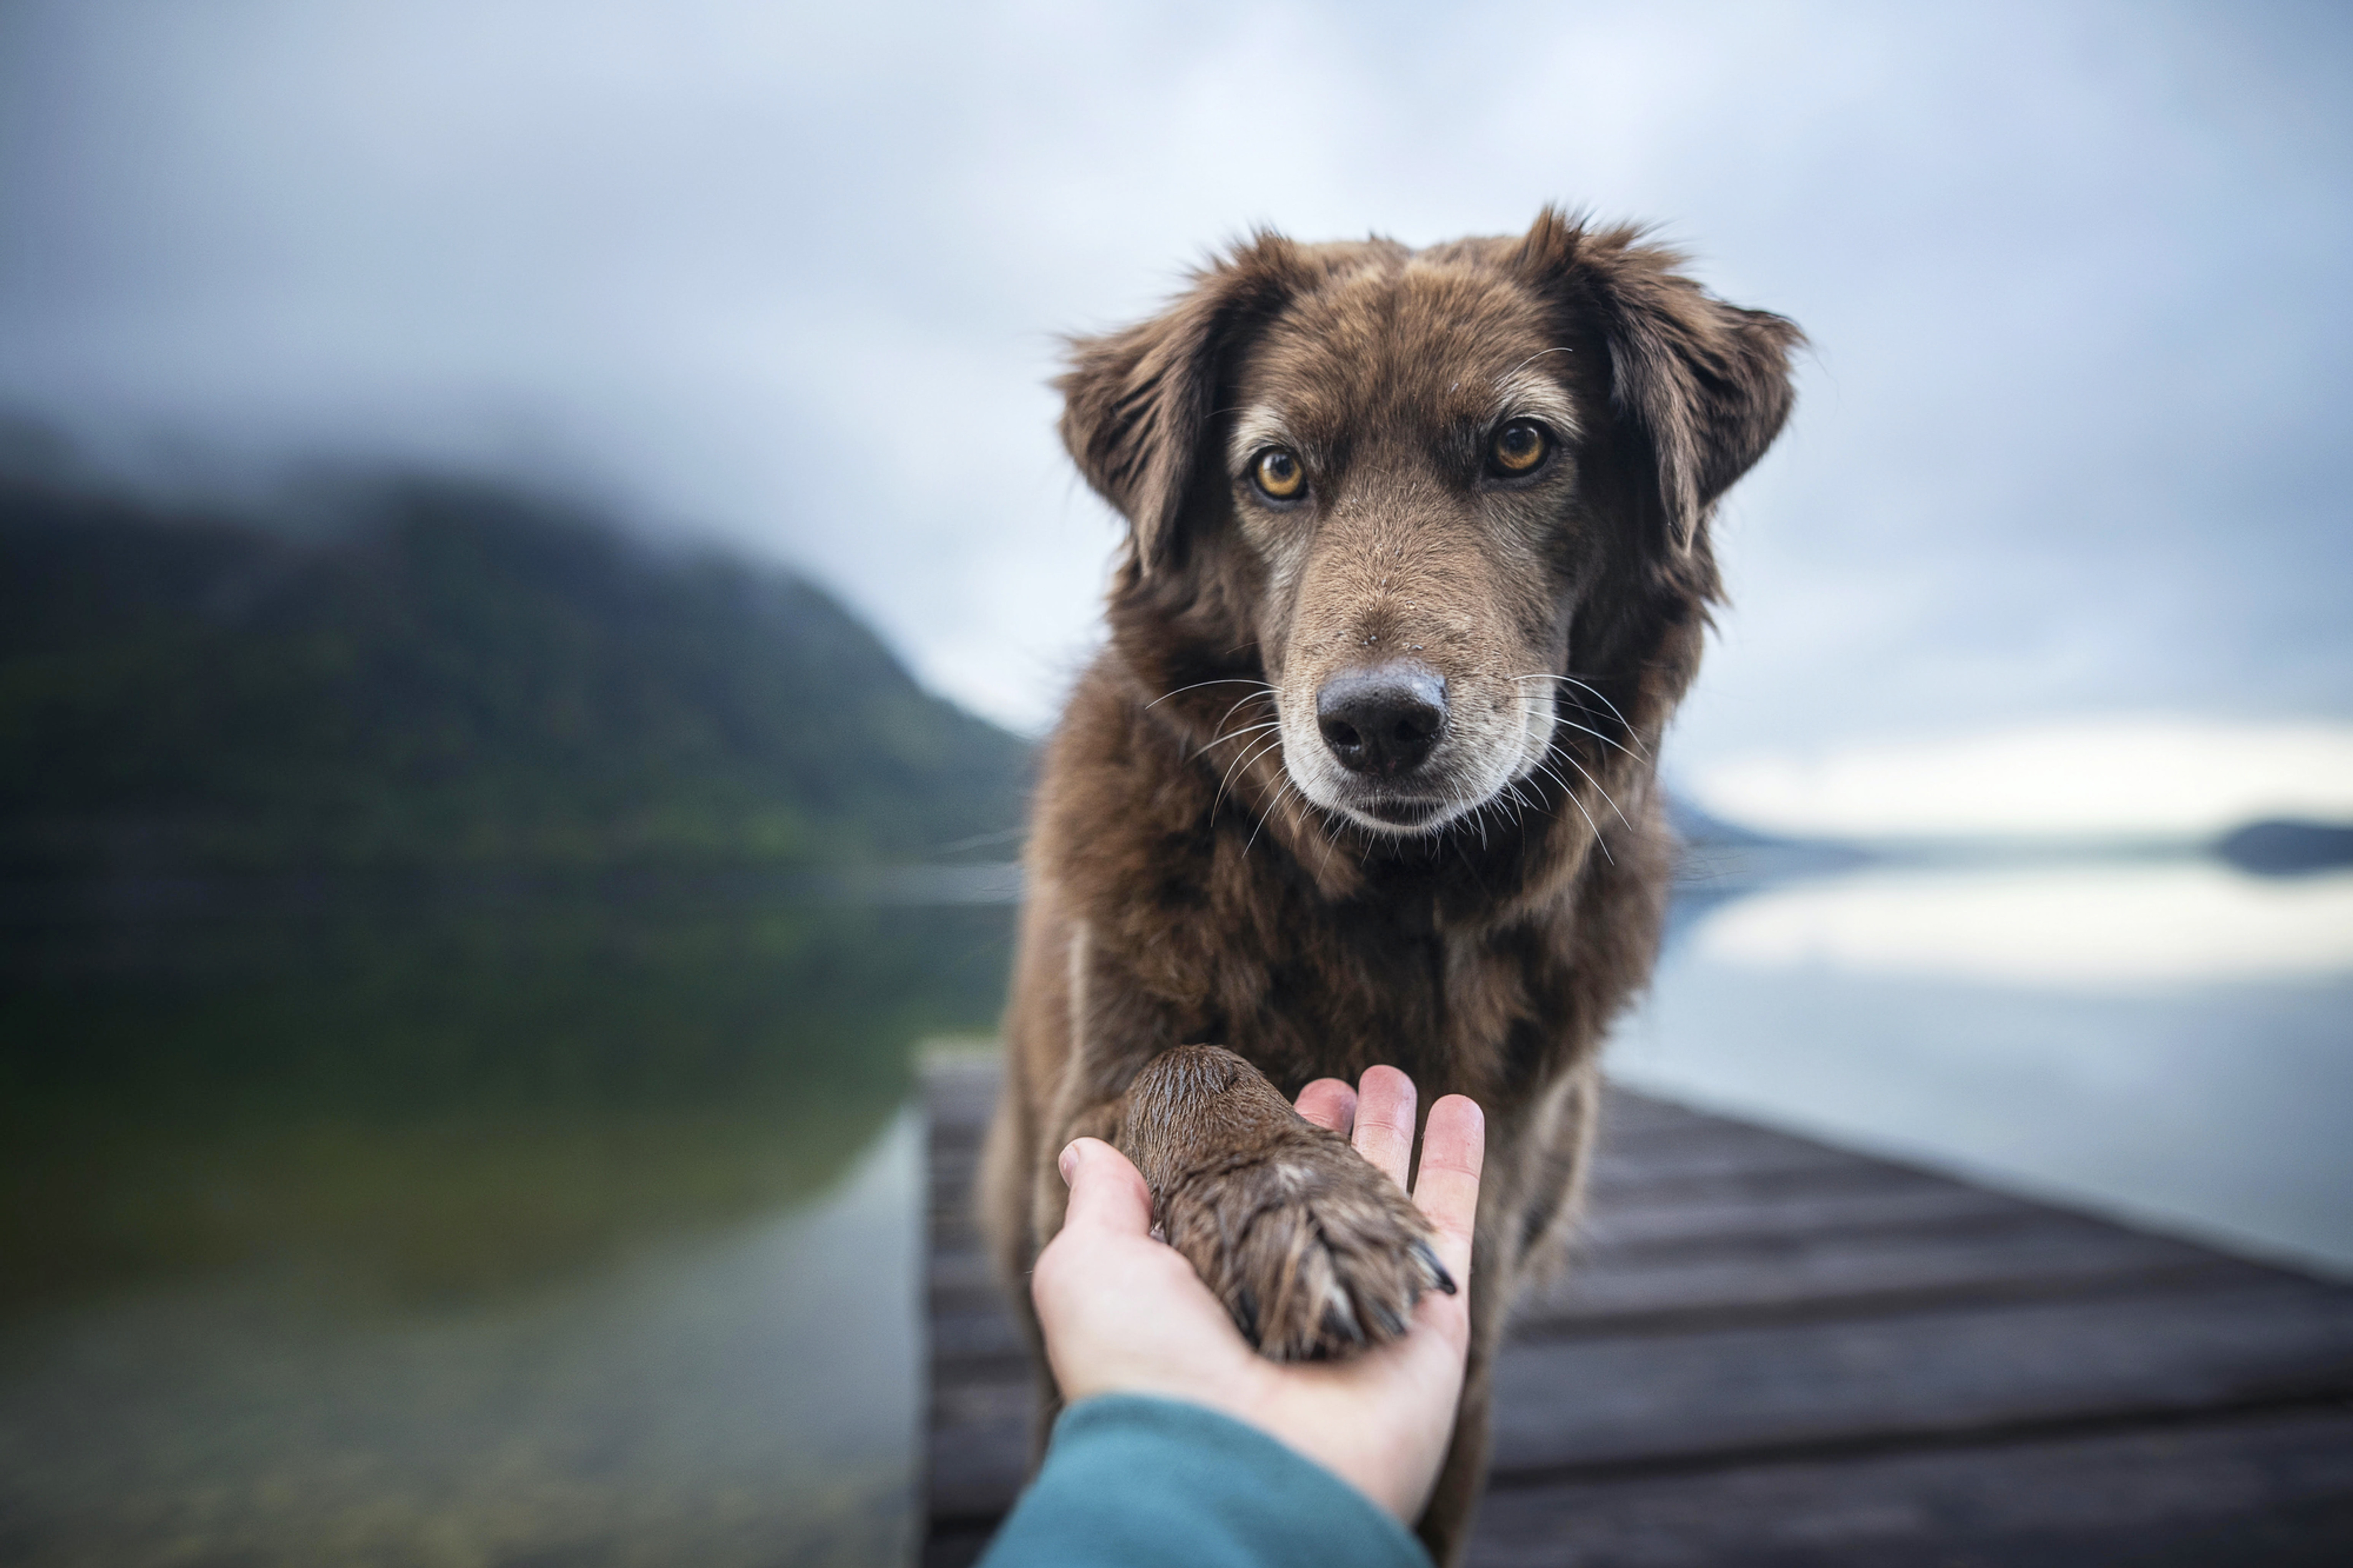 LEARN HOW TO SPEAK DOG!